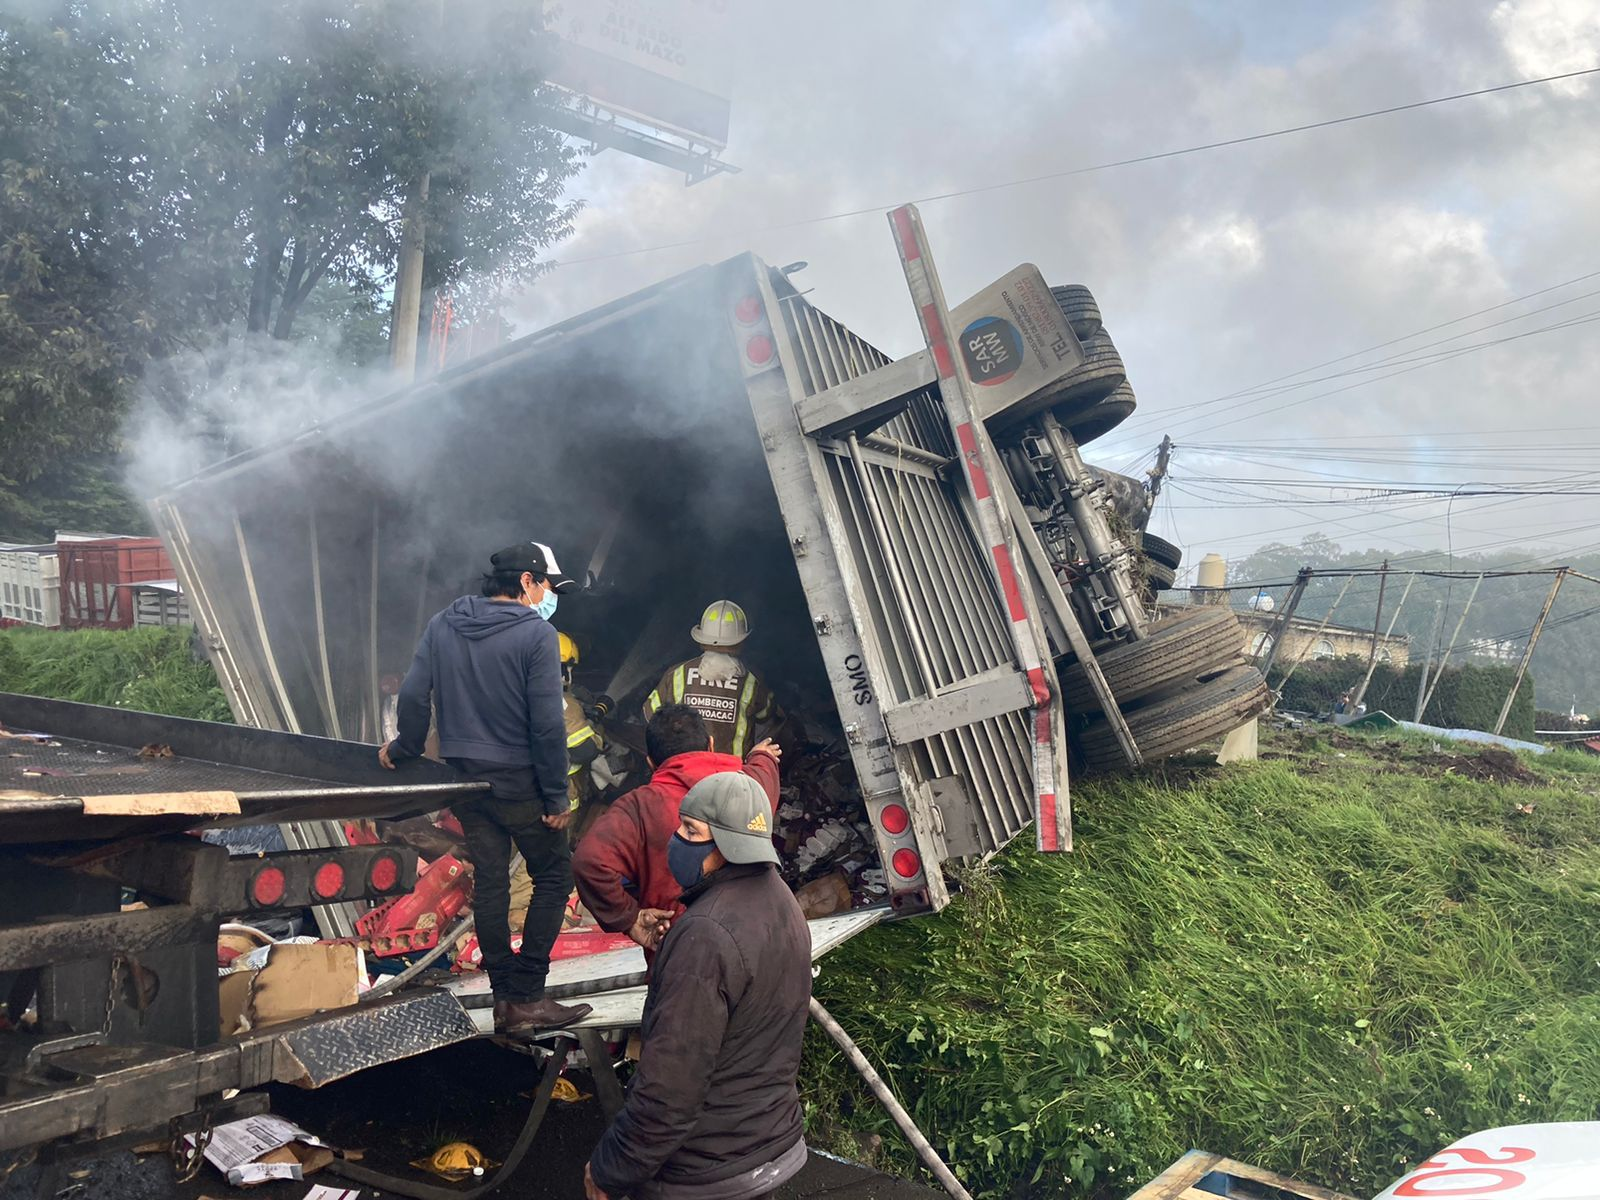 Arde tráiler en la México-Toluca; chofer a la fuga - Sep 18, 2021